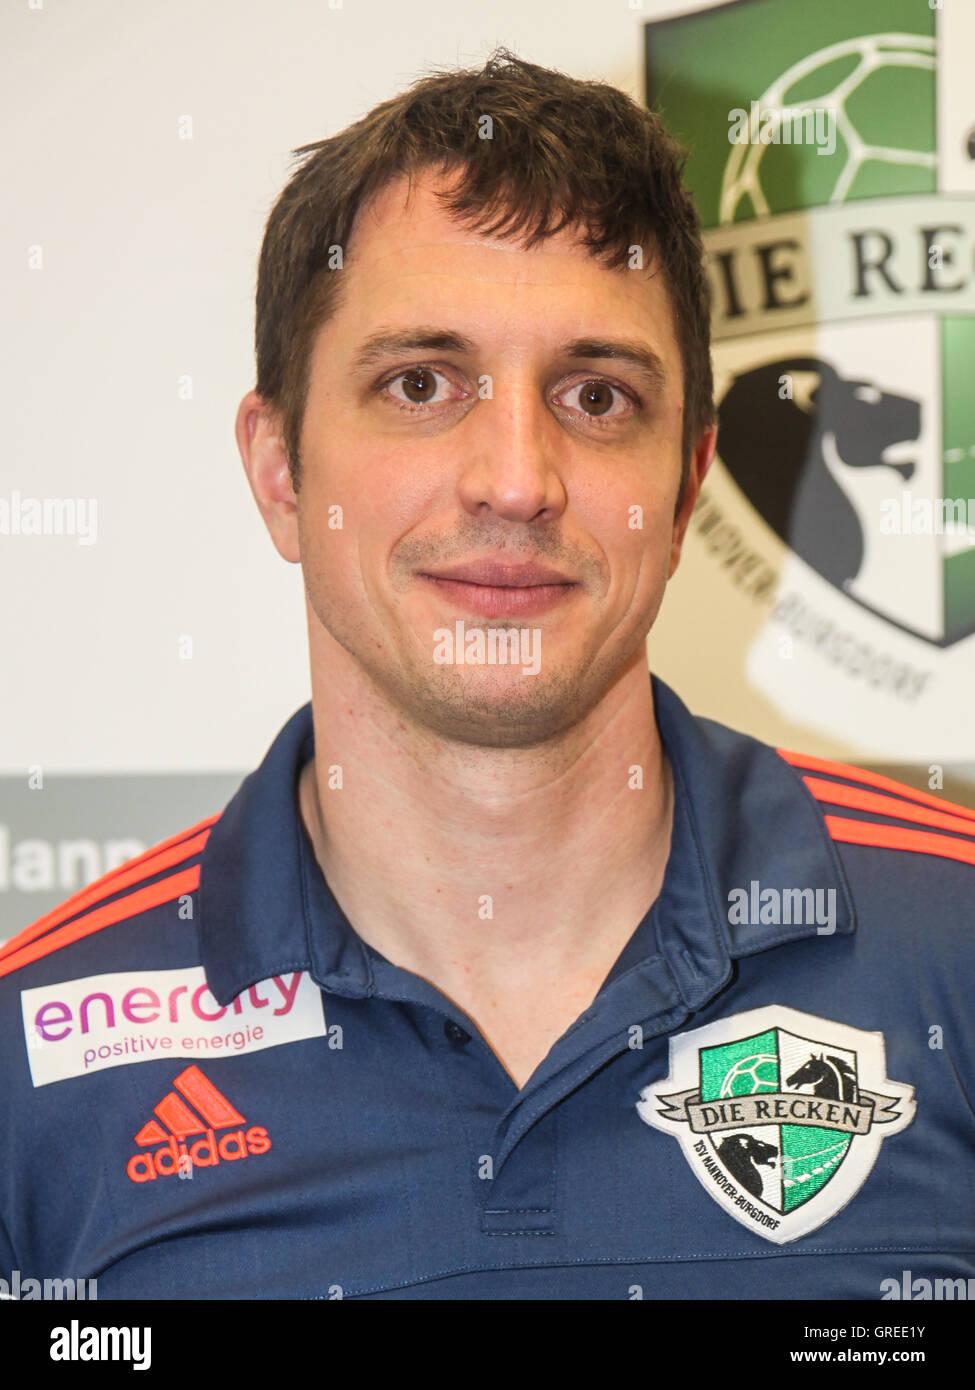 Coach Jens Buerkle Tsv Hannover Burgdorf - Stock Image